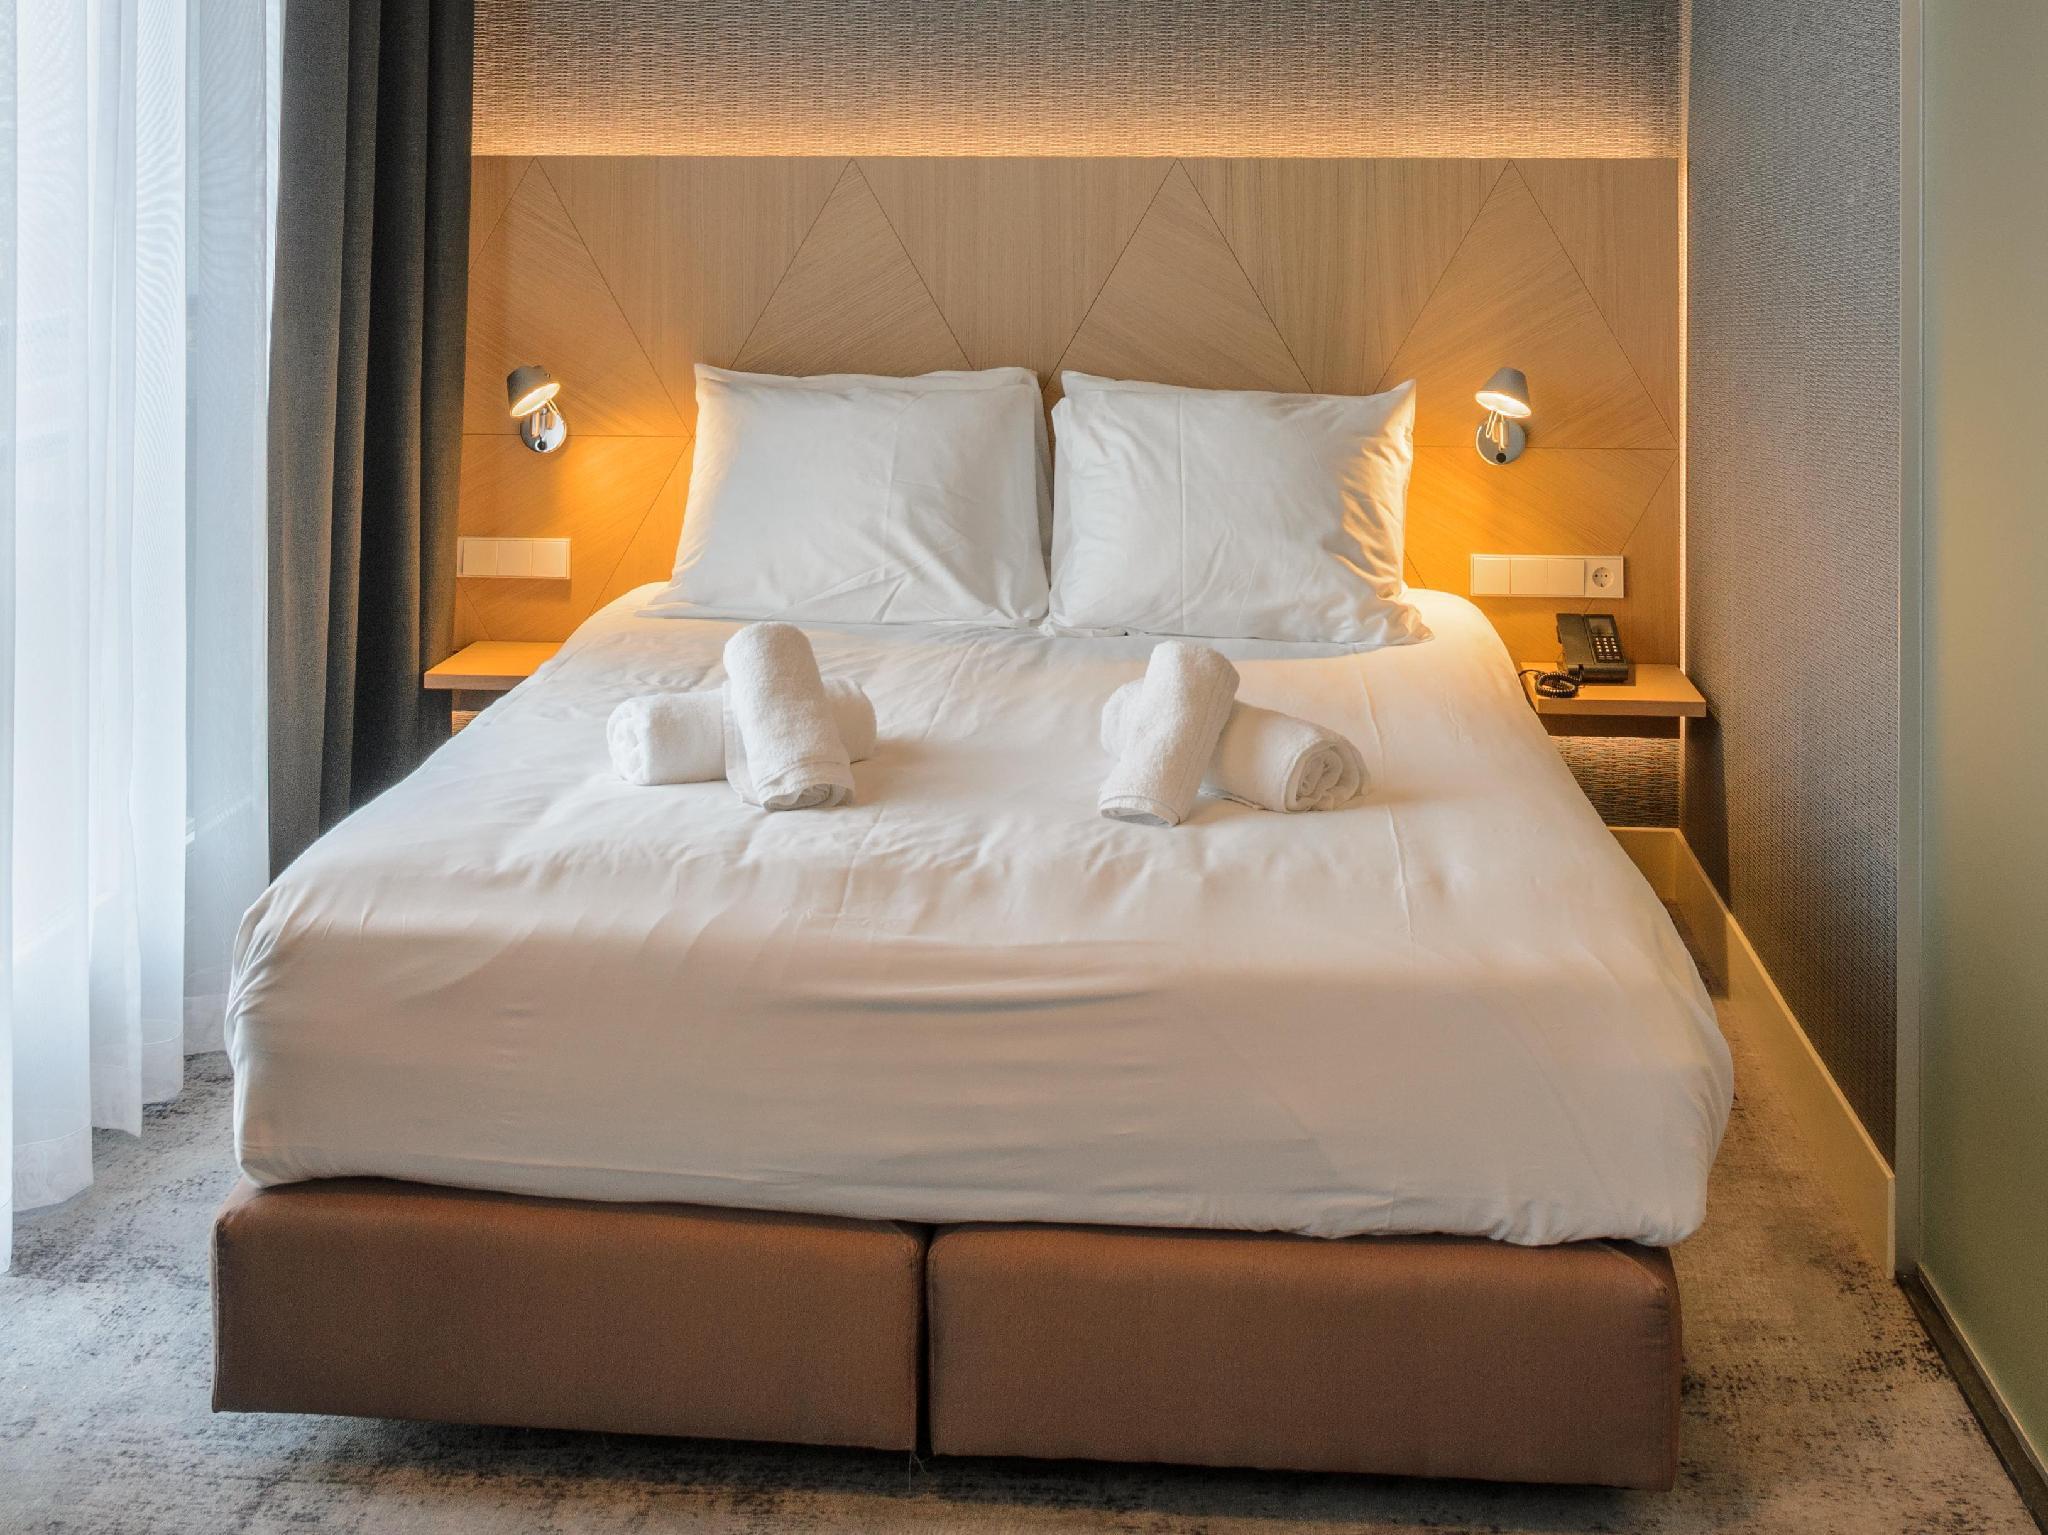 Amadi Panorama Hotel Best Price On Amadi Panorama Hotel In Amsterdam Reviews